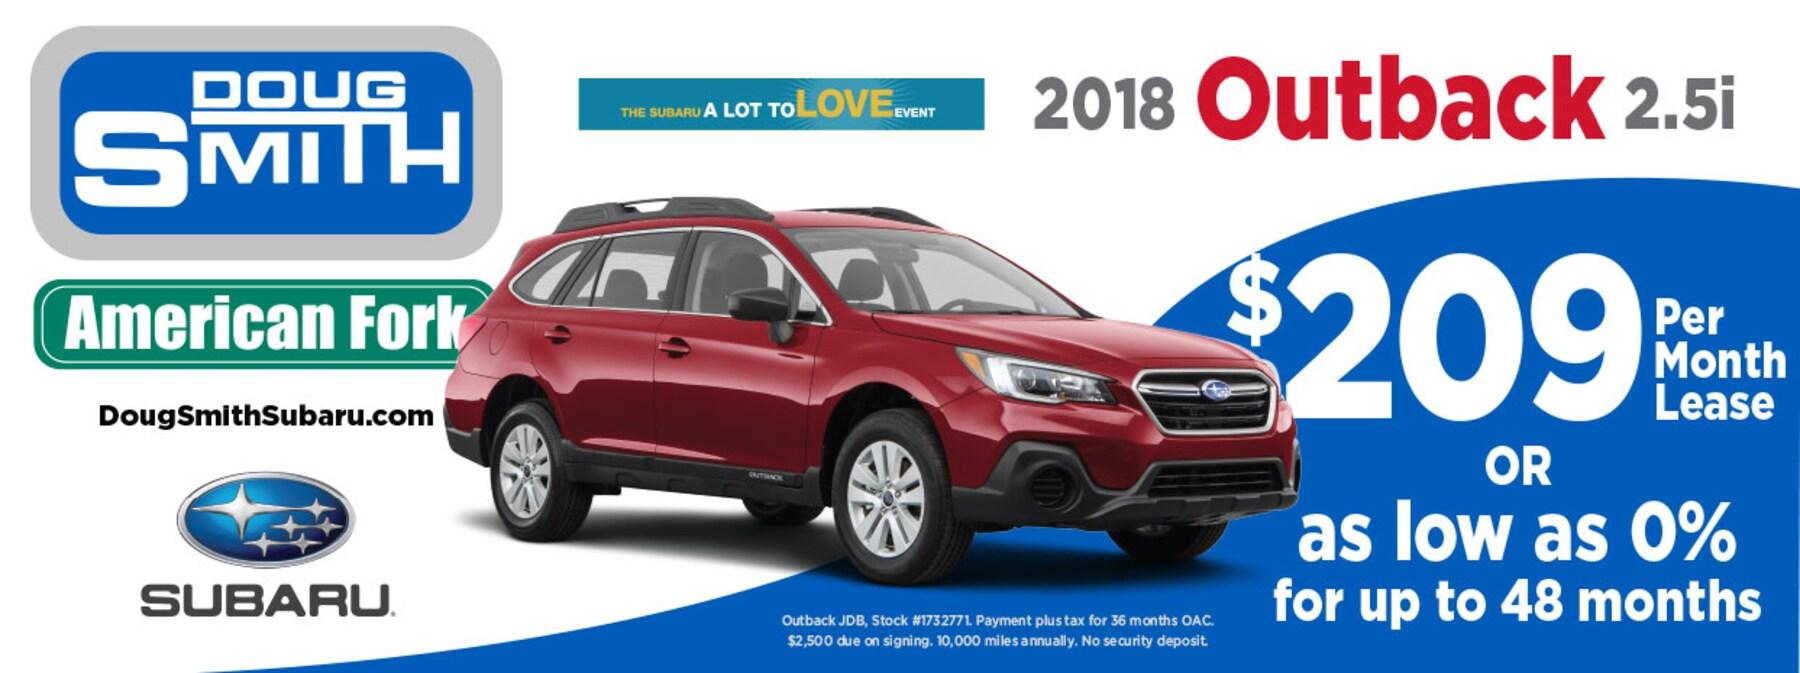 New & Used Subaru Car Dealer American Fork | New Subaru and Used ...